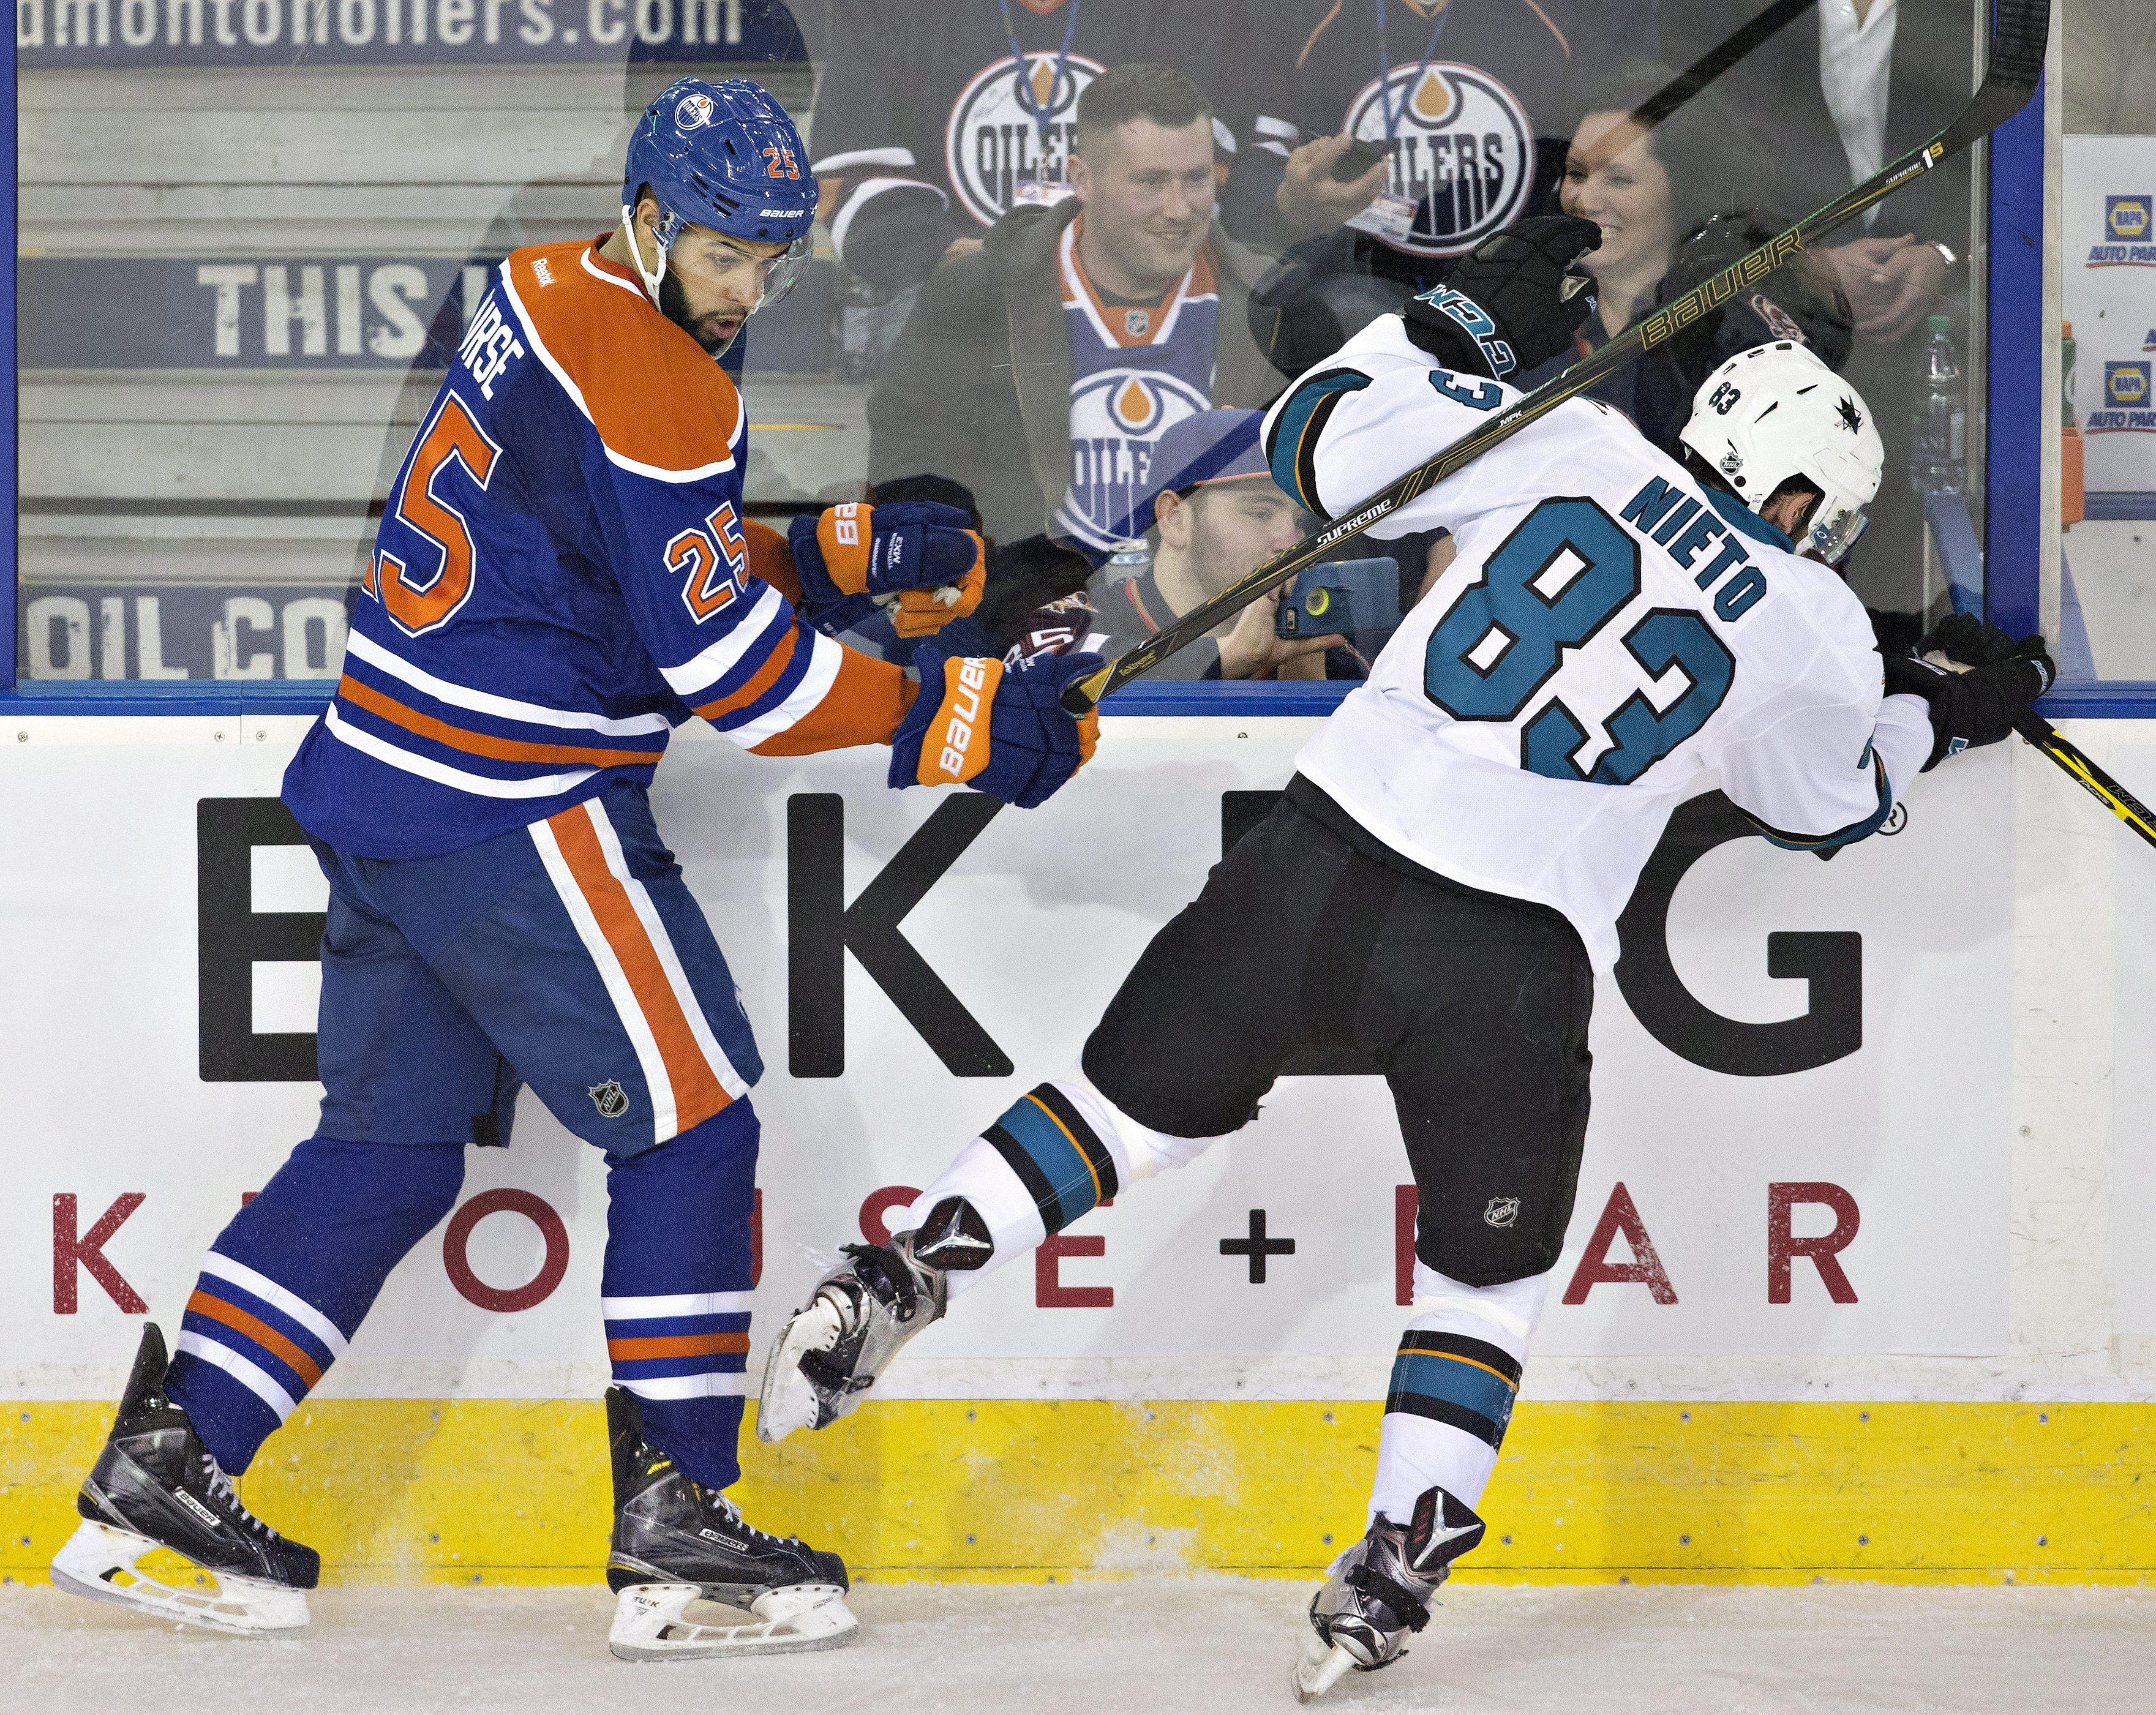 San Jose Sharks ' Matt Nieto (83) is checked by Edmonton Oilers' Darnell Nurse (25) during second period NHL action in Edmonton, Alberta, Tuesday March 8, 2016. (Jason Franson/The Canadian Press via AP)